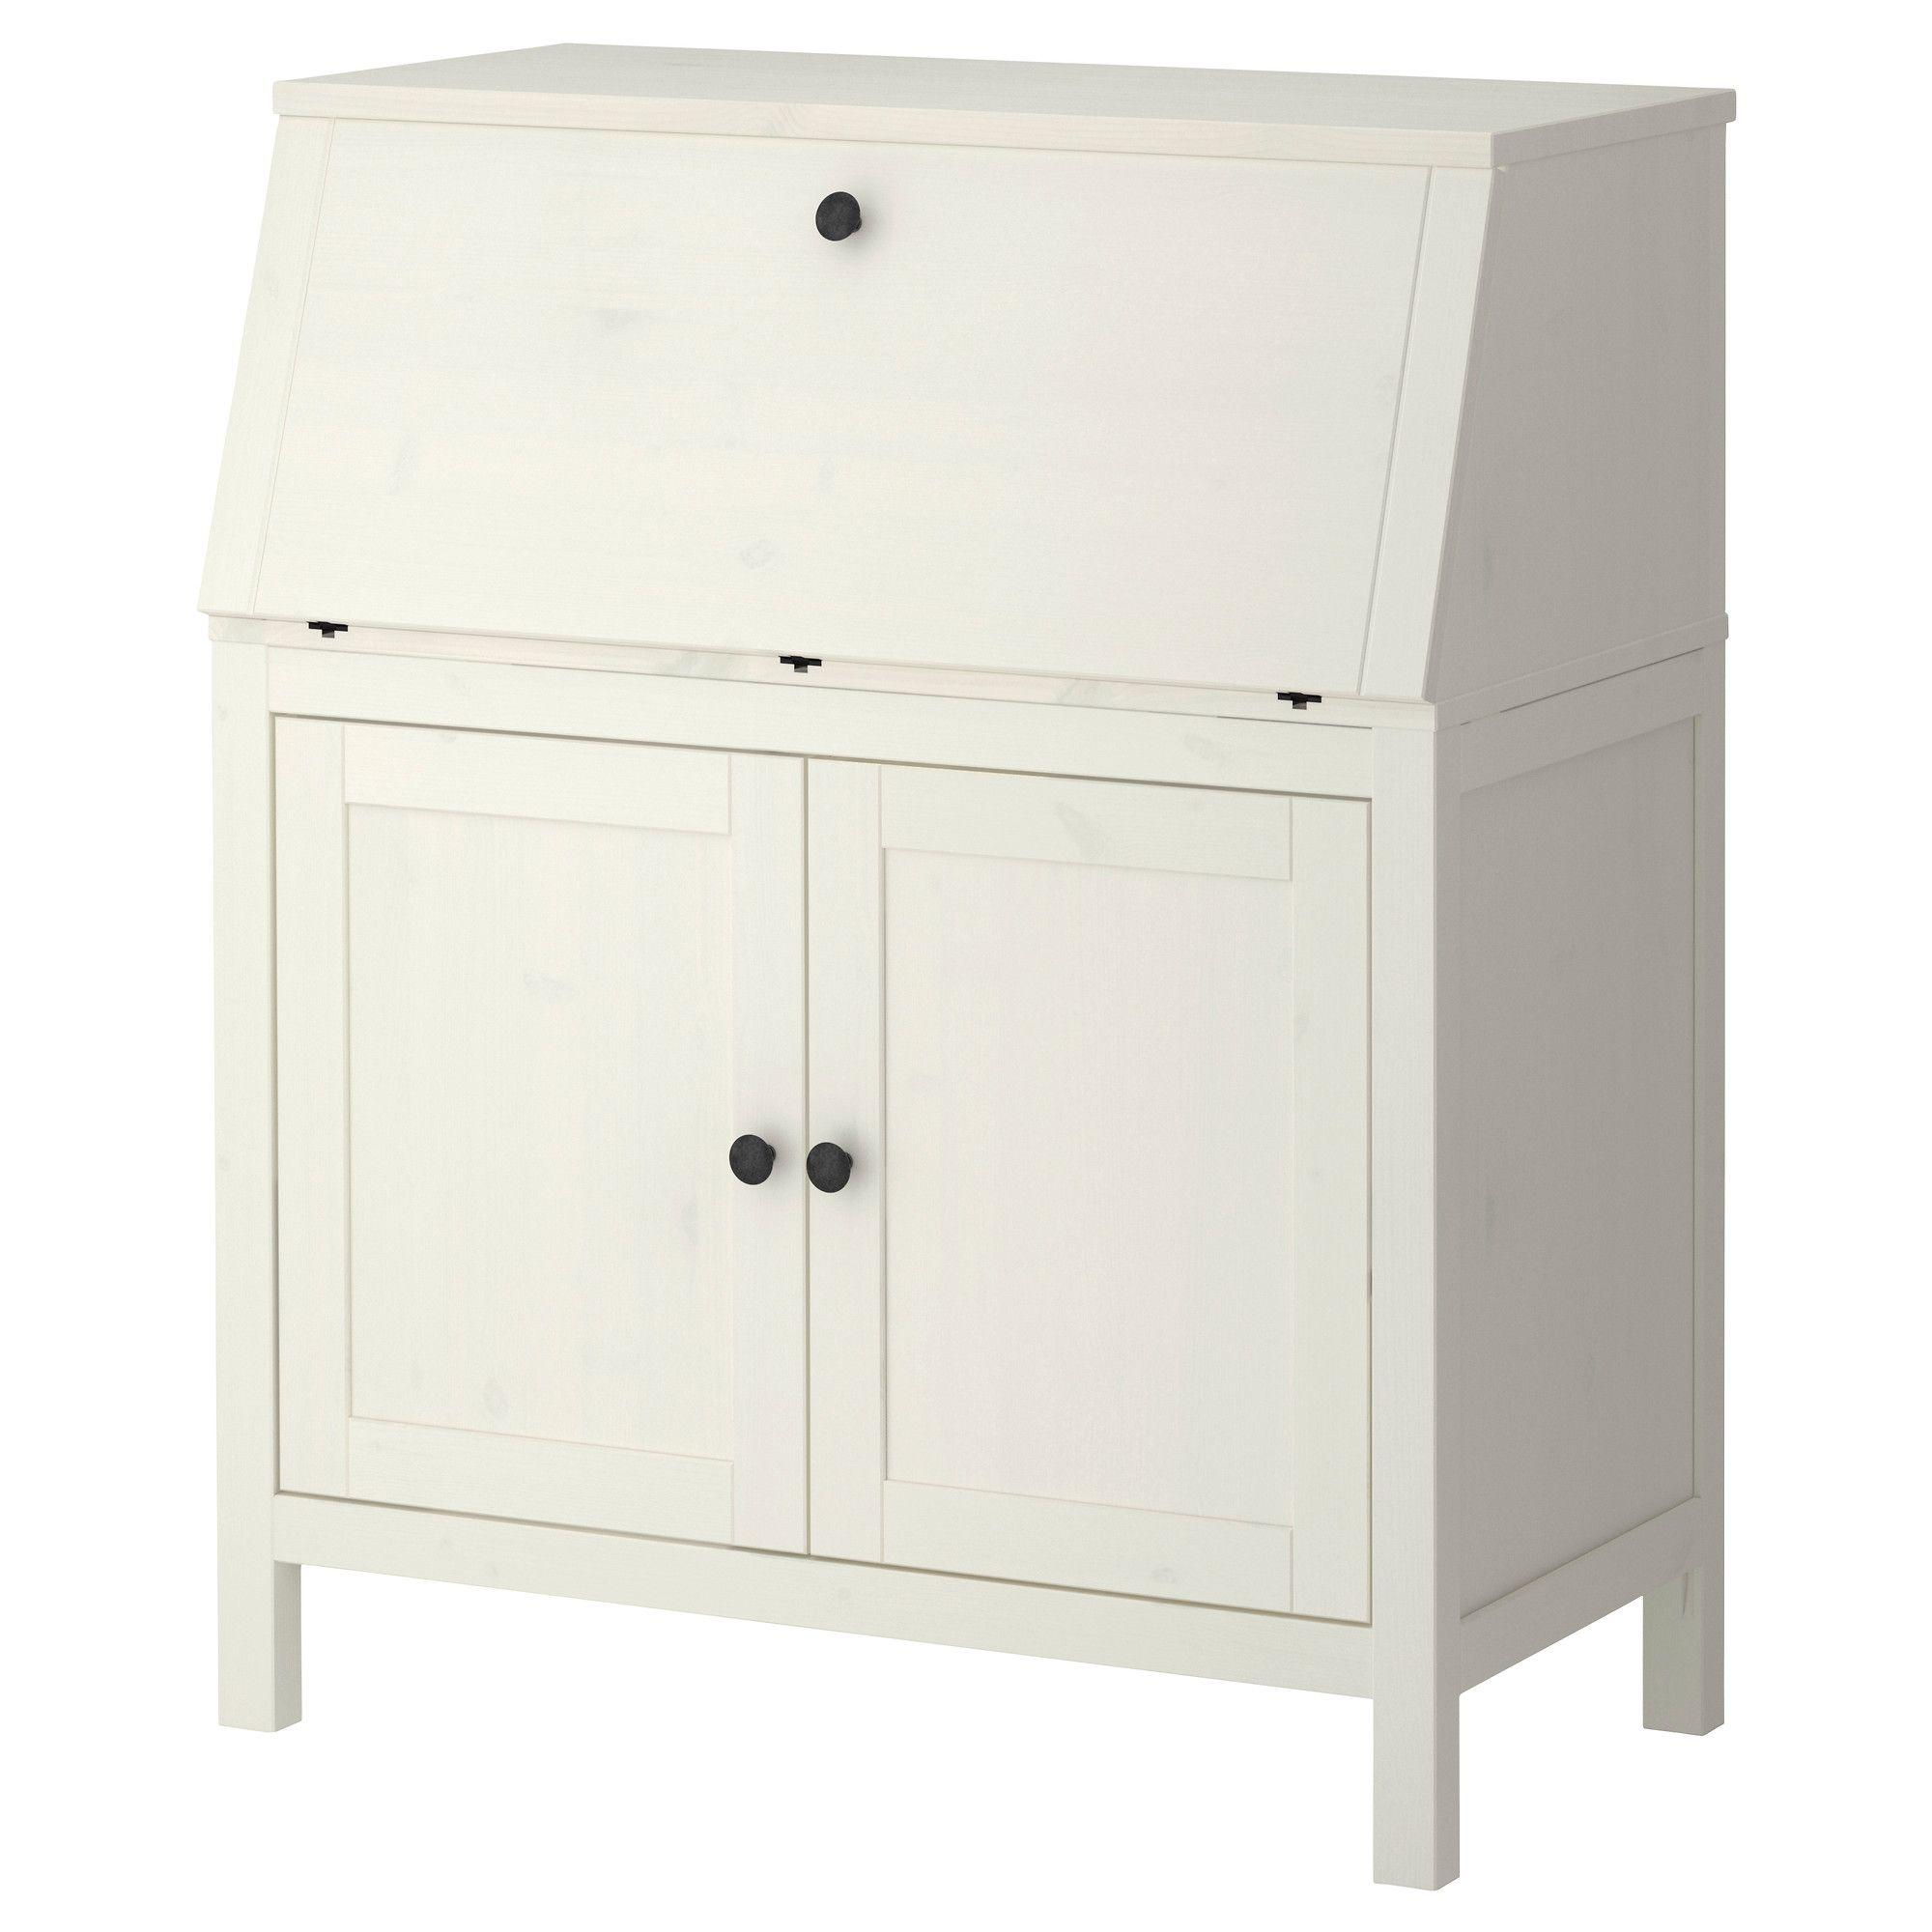 Ikea Us Furniture And Home Furnishings Hemnes Secretary Desks Ikea